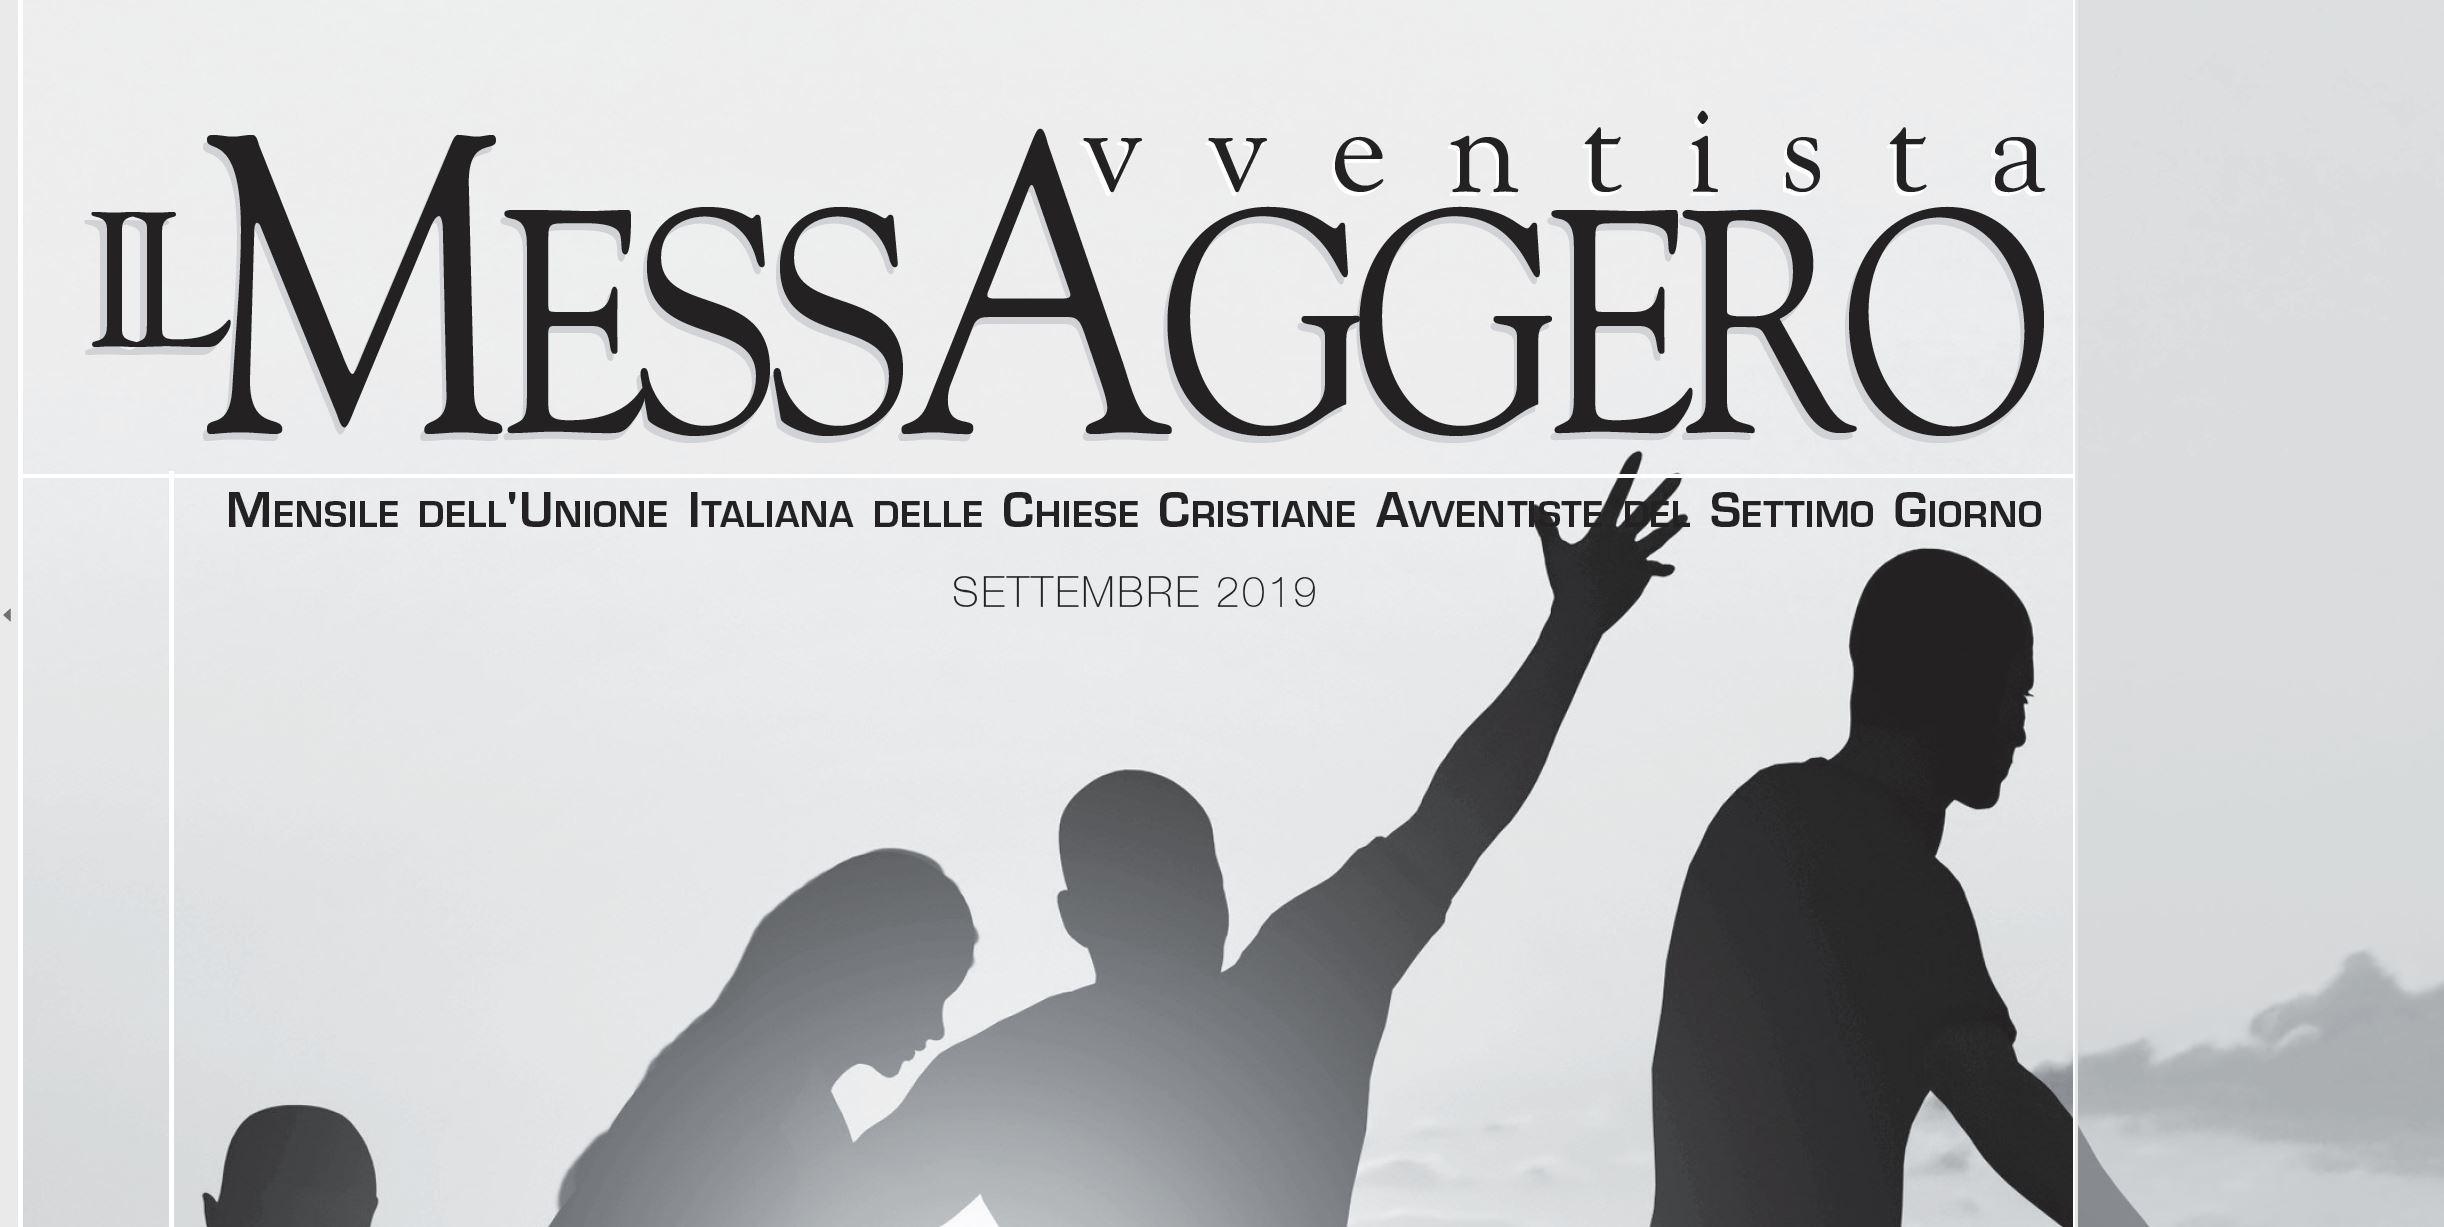 Messaggero - Set. 2019